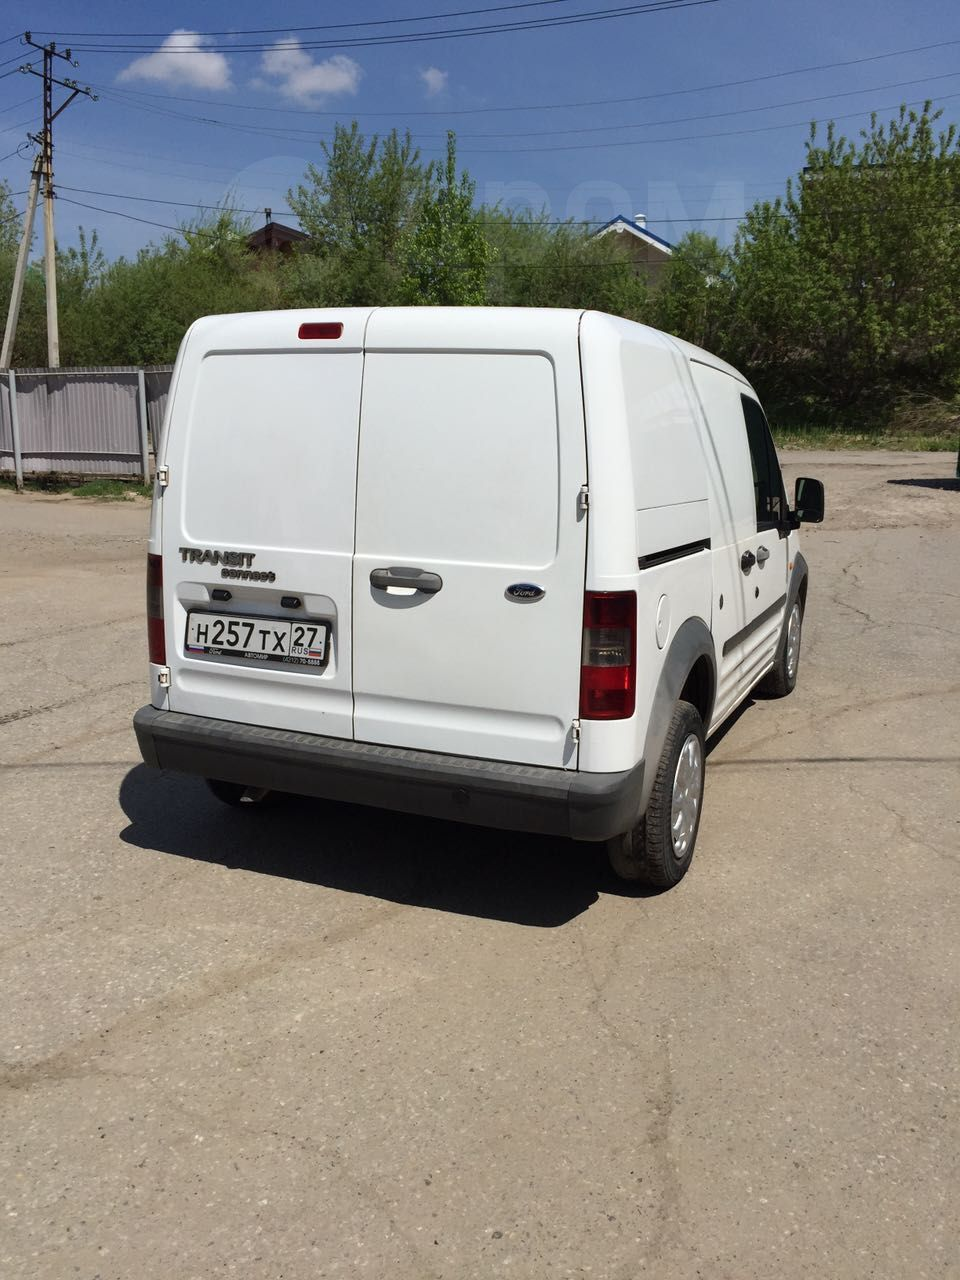 Купить Форд Турнео Коннект 2007 в Хабаровске, Продам Ford ...: http://habarovsk.drom.ru/ford/tourneo_connect/26123213.html